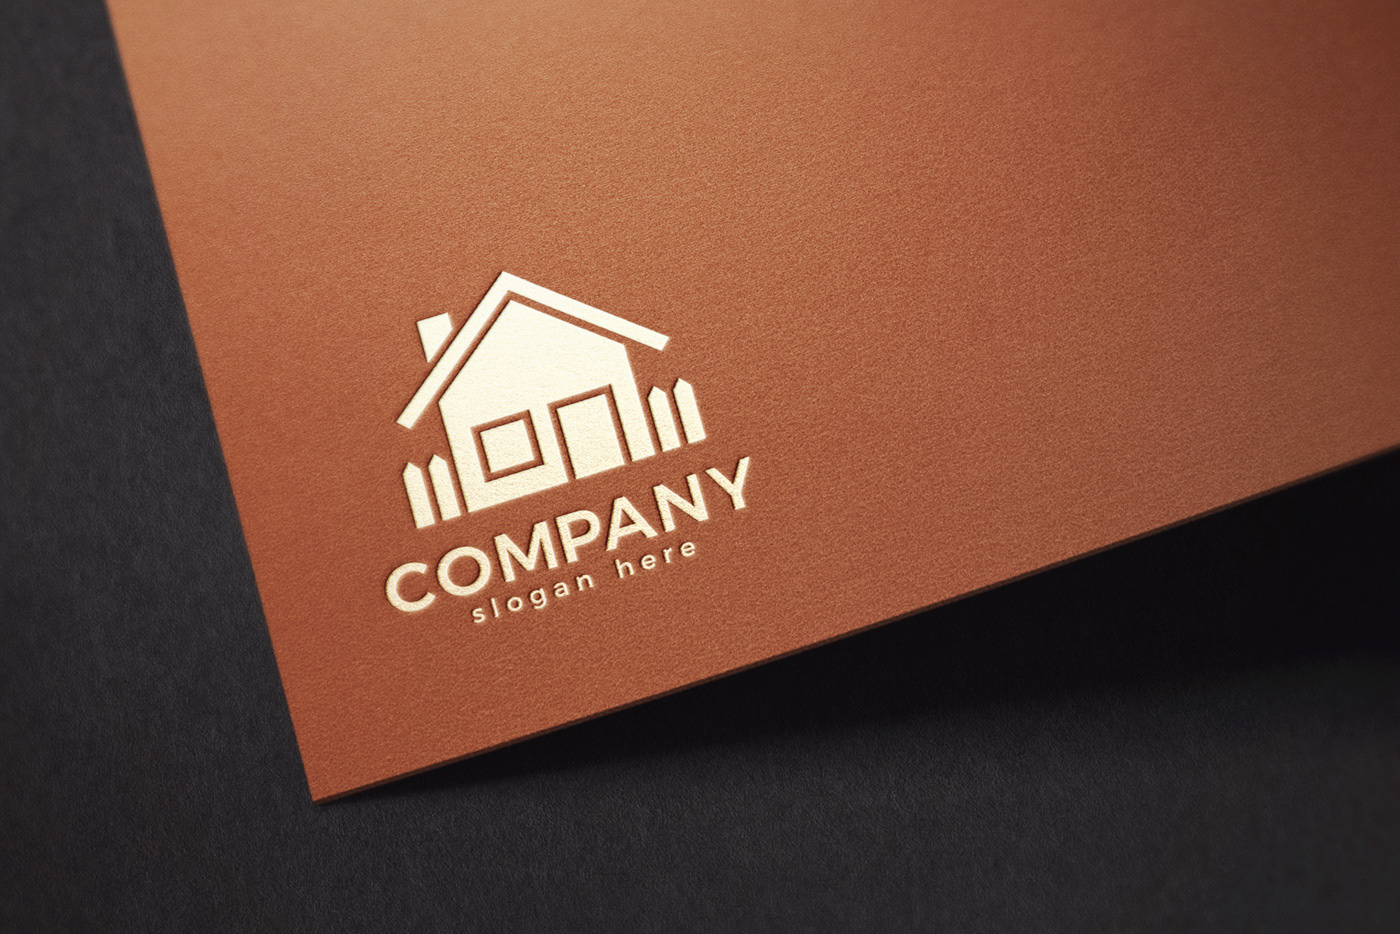 Image may contain: book and logo